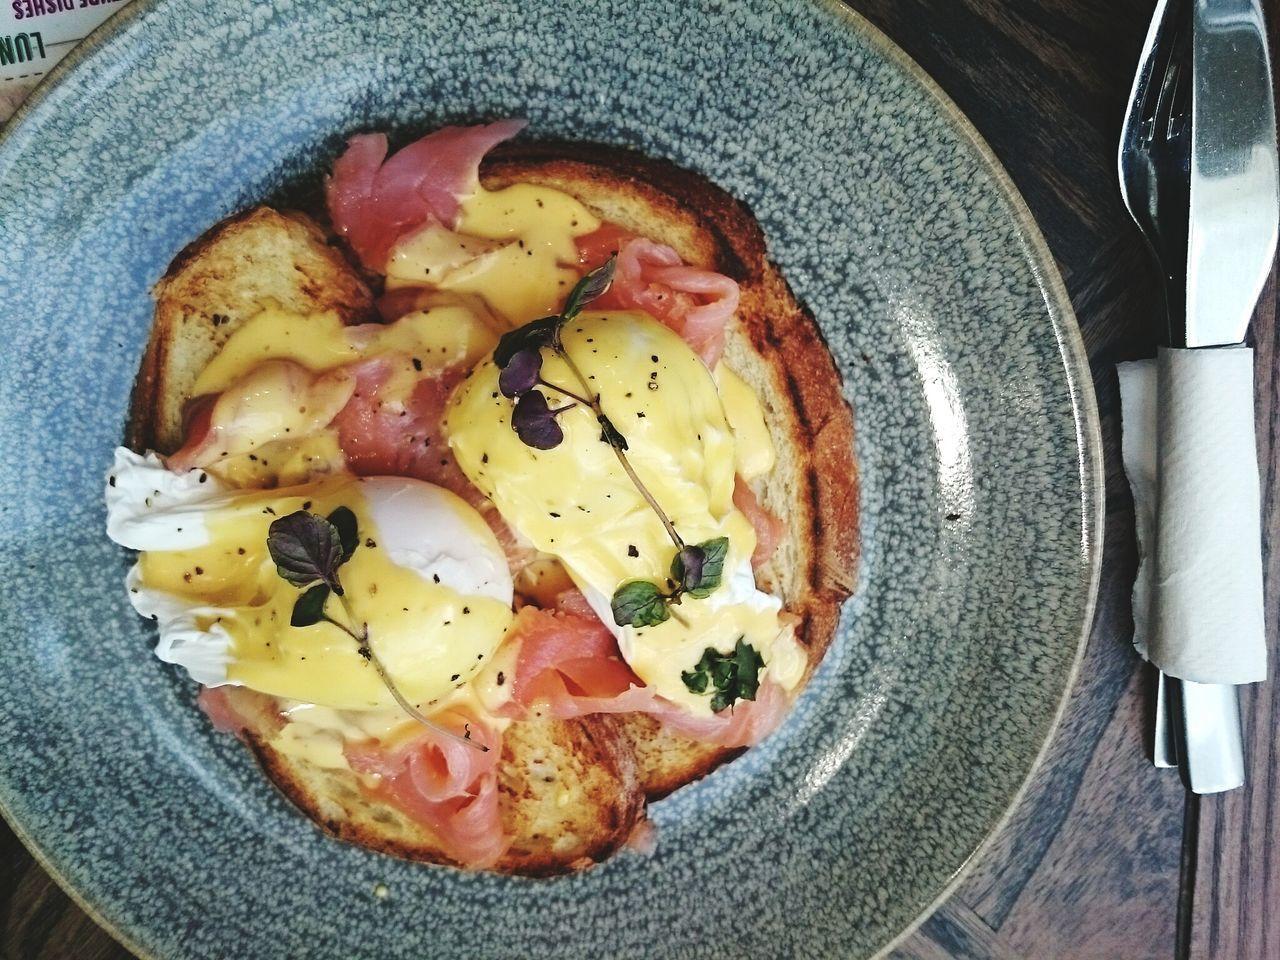 Brekkie. Nom. Foodporn Eggsbenedict My World Of Food Foodphotography Breakfast Breakfast Time Eggs